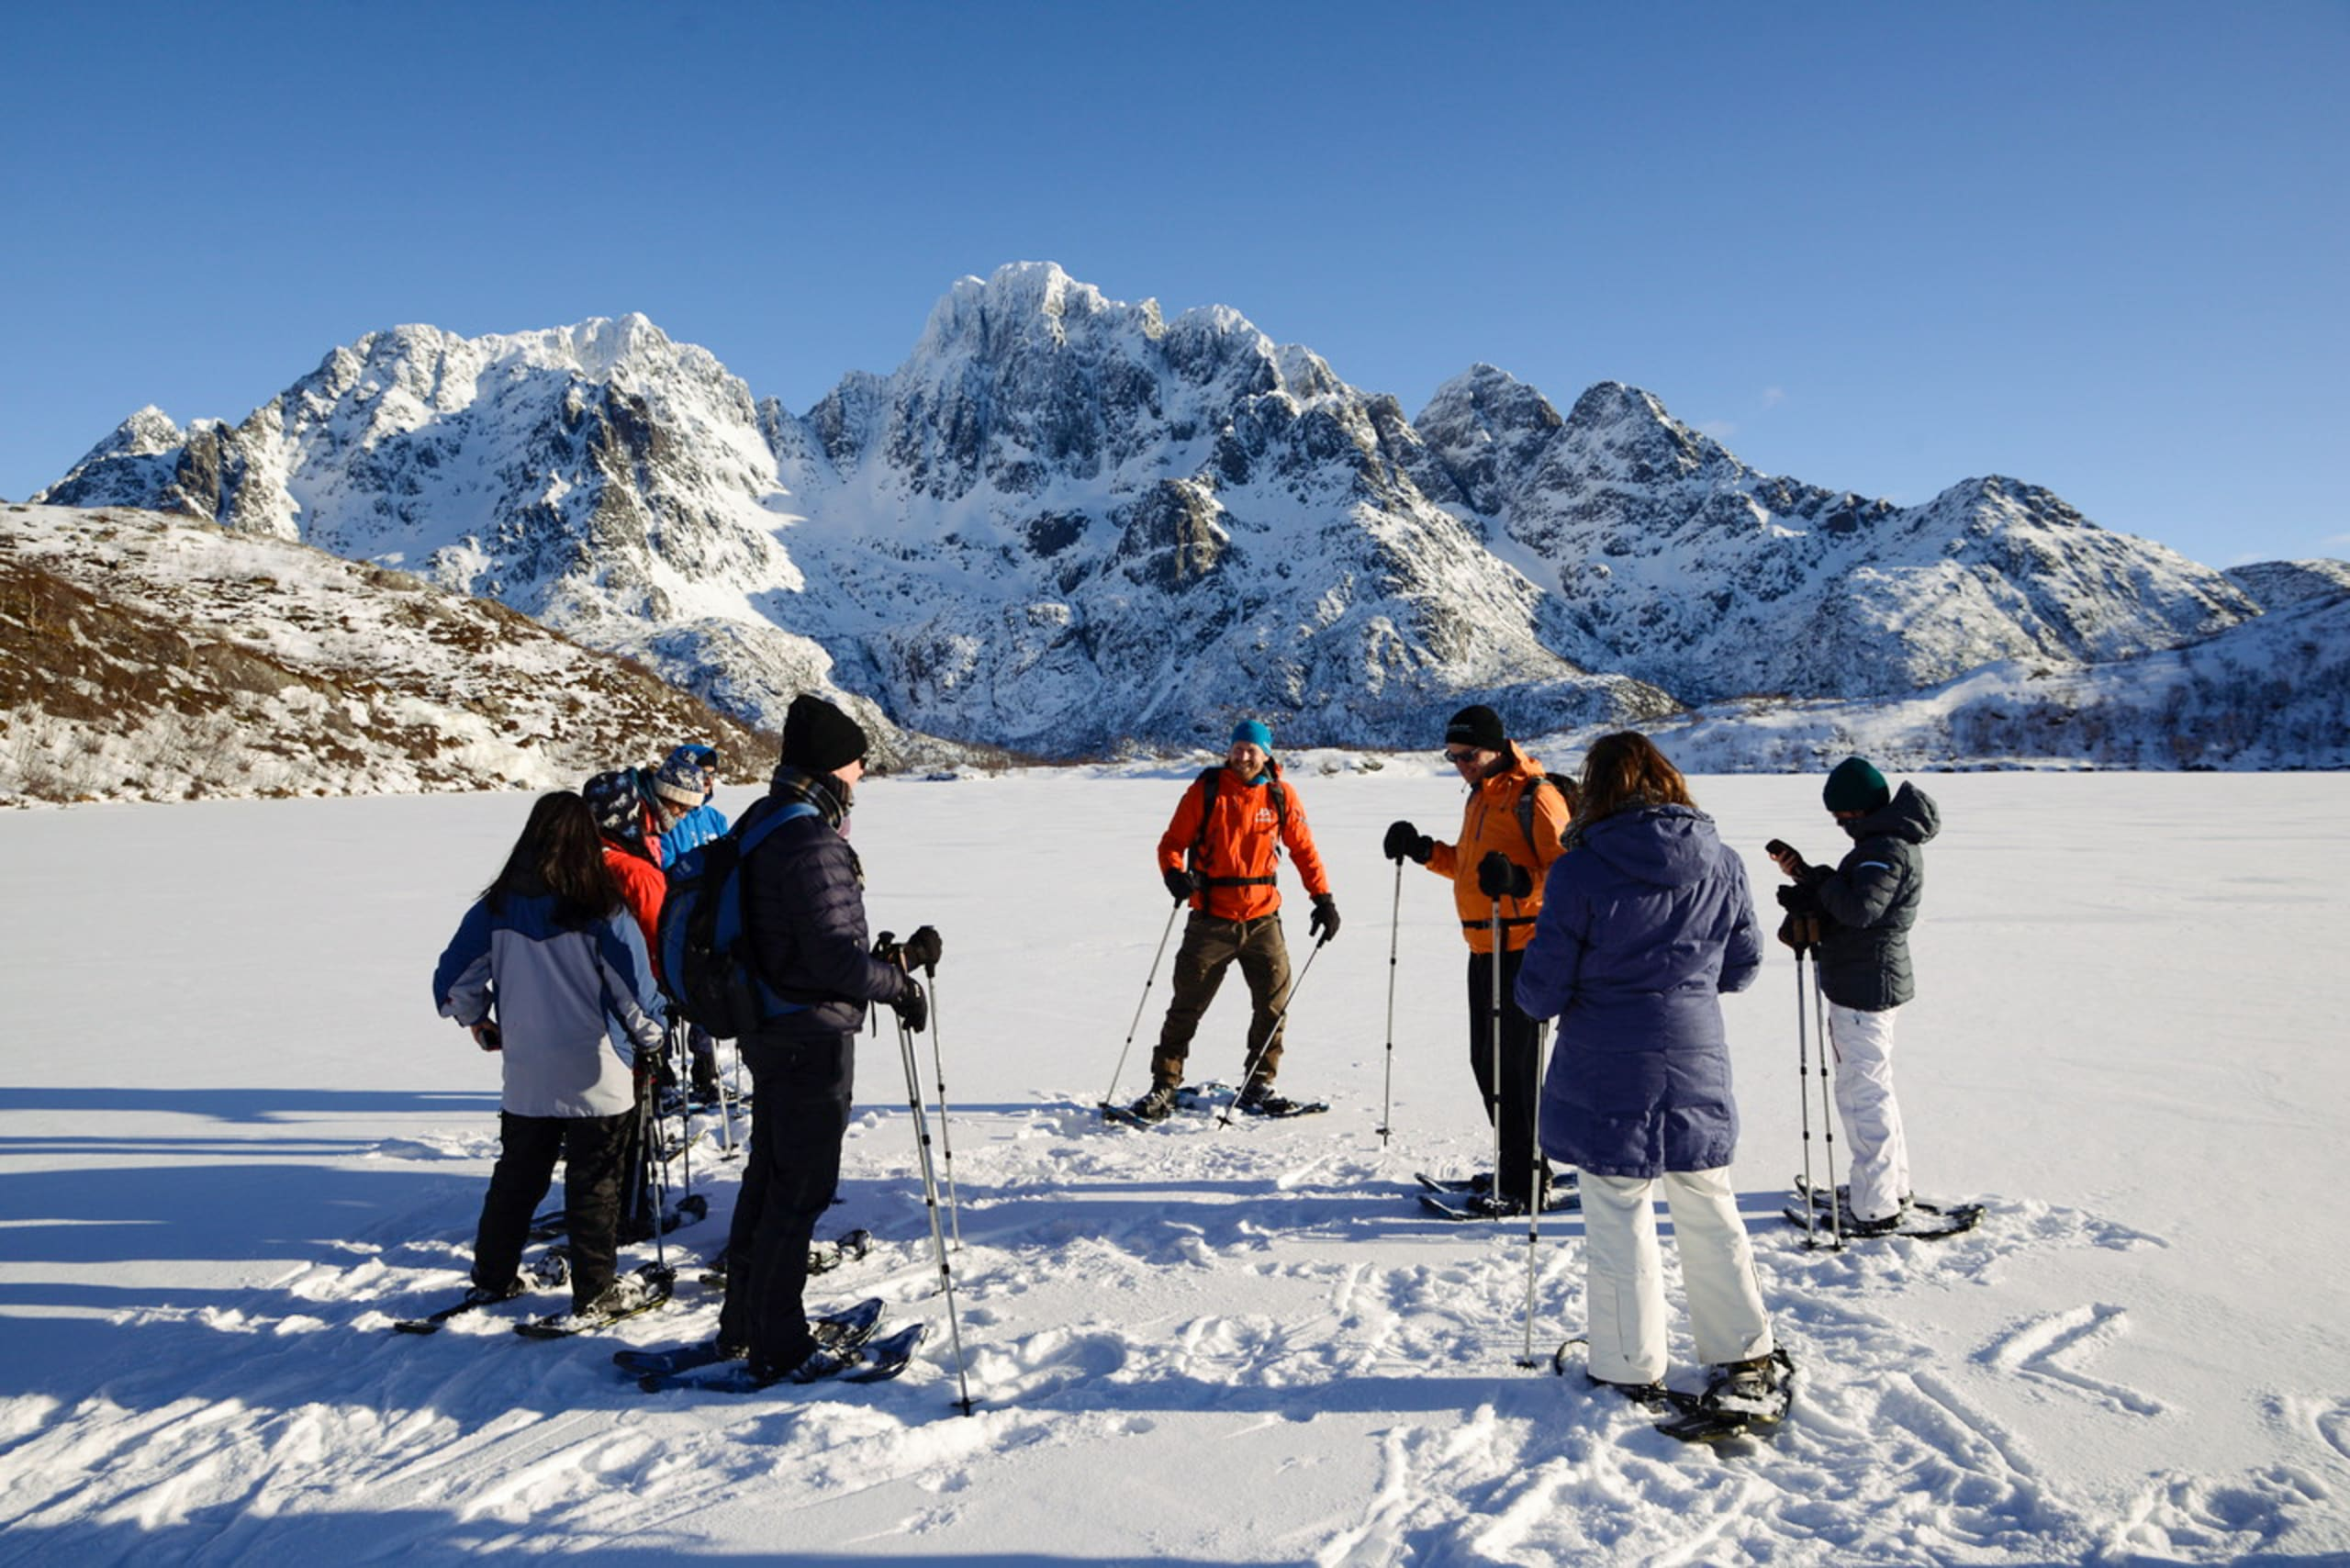 Group of tourists on nature safari in the Lofoten mountains